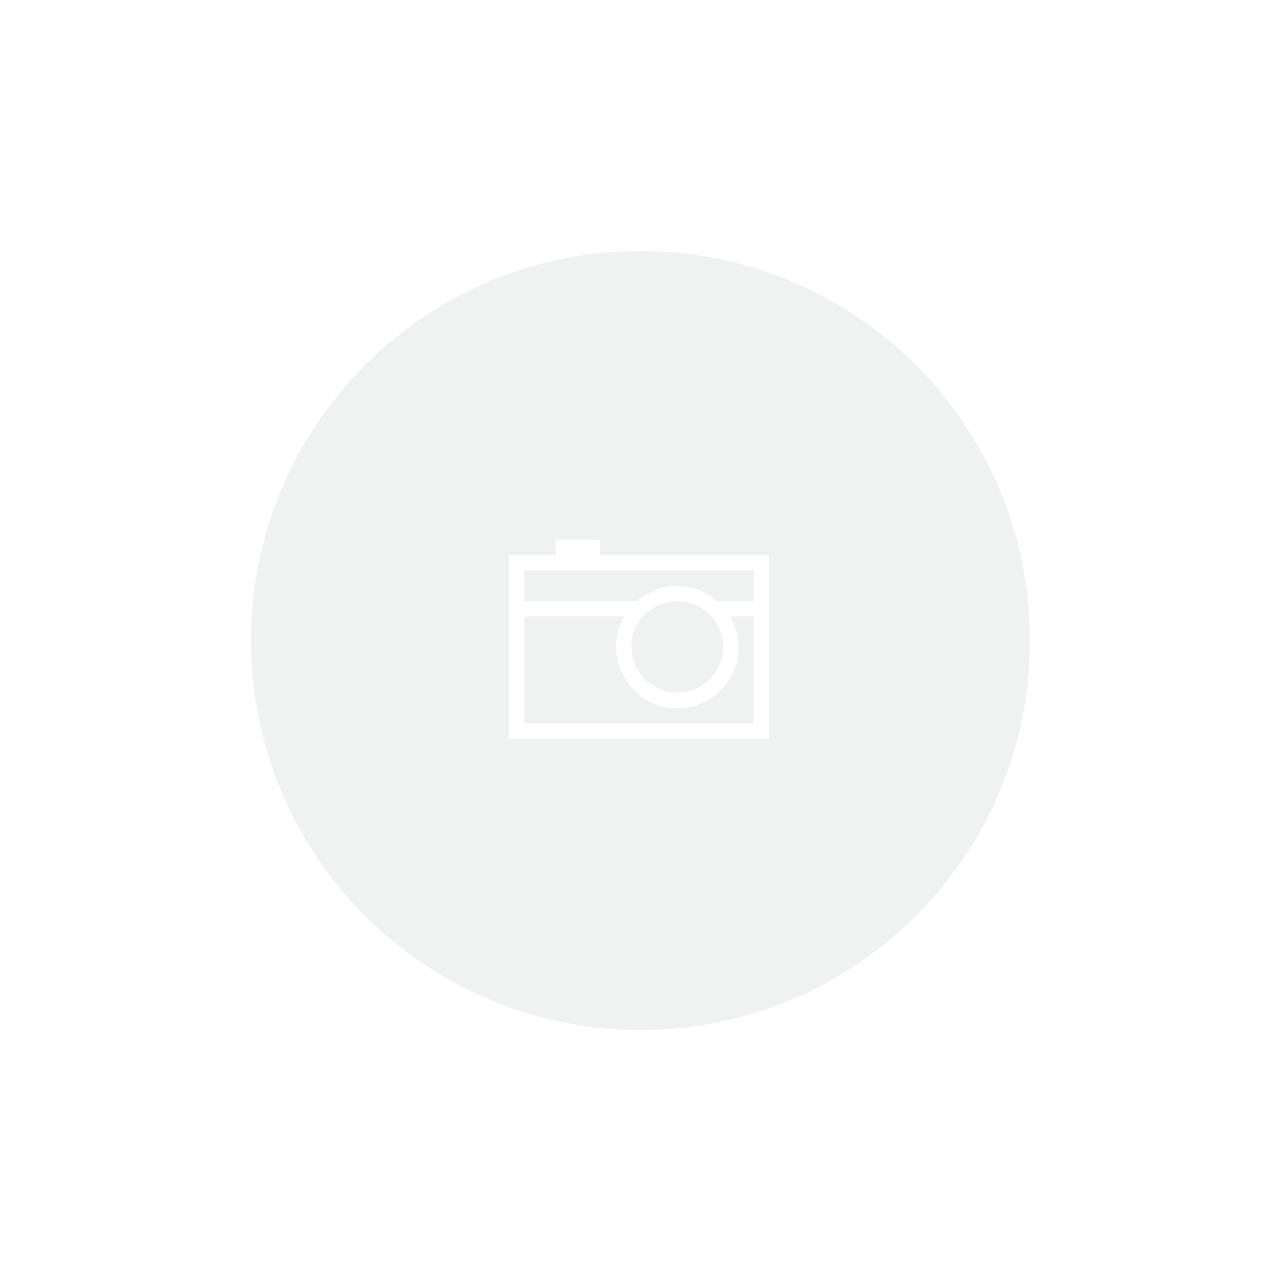 Camiseta adulto branca - LINHA PROMOCIONAL